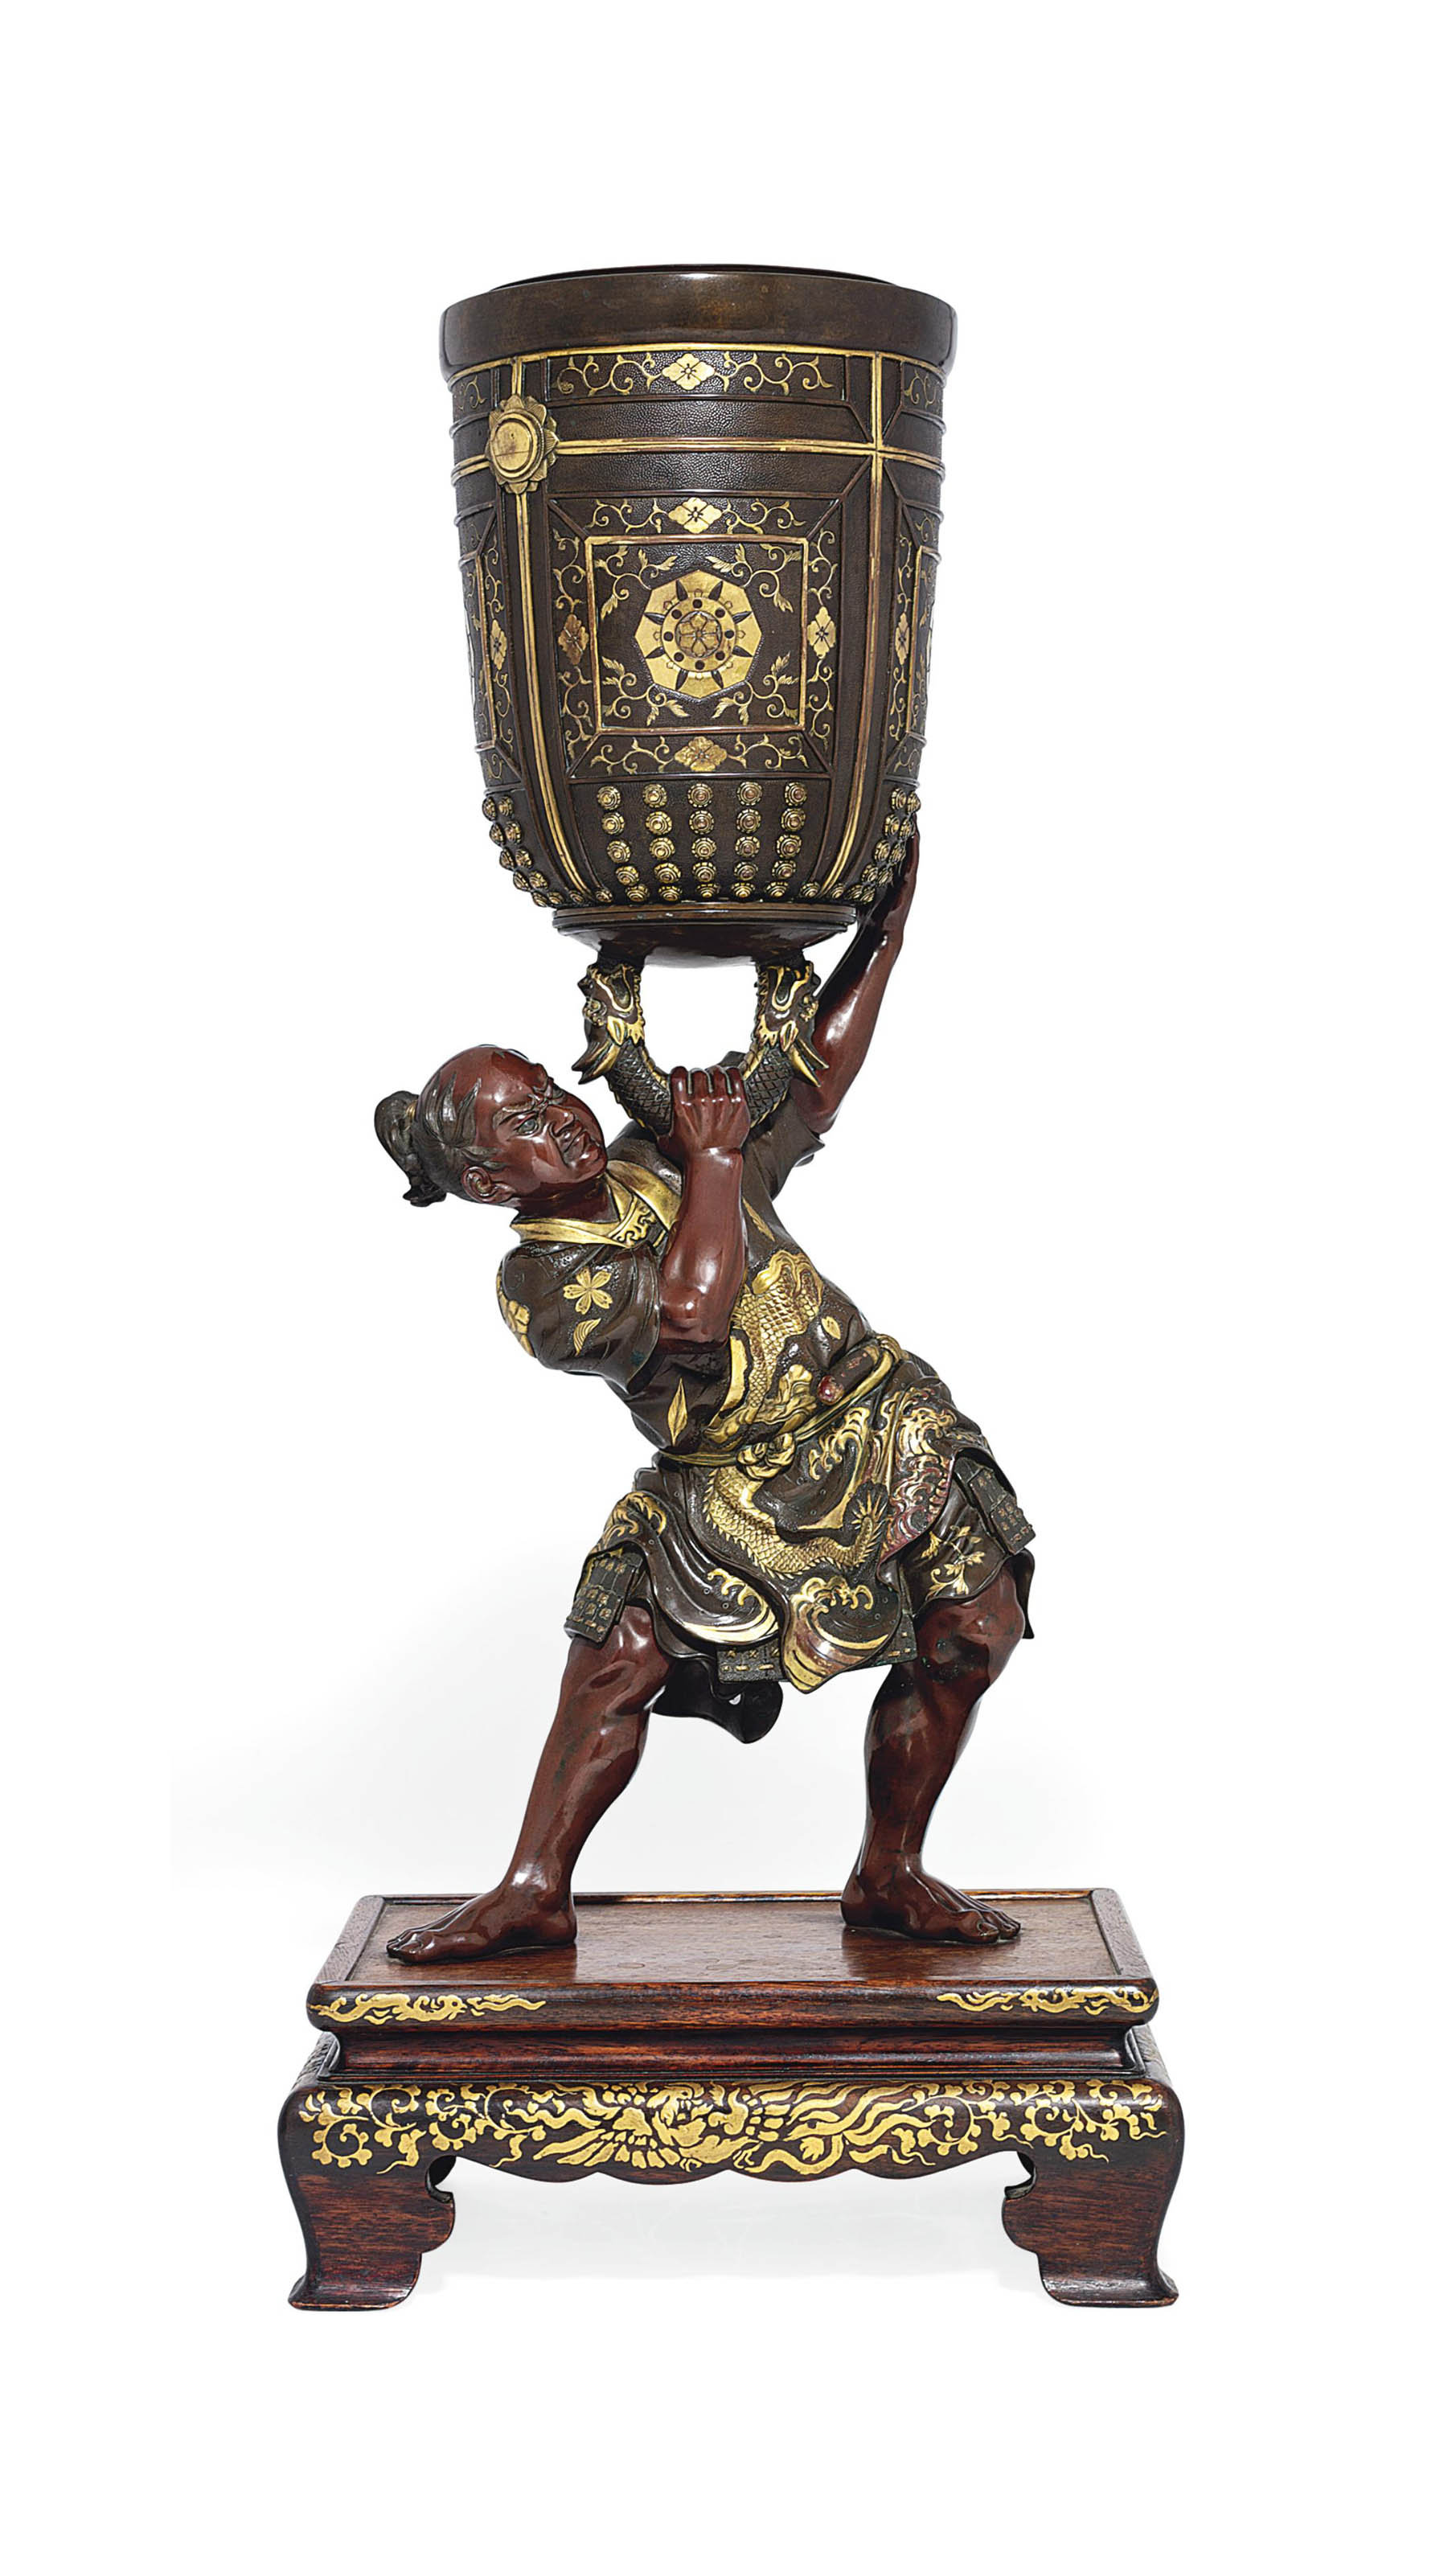 An Impressive Bronze Sculpture